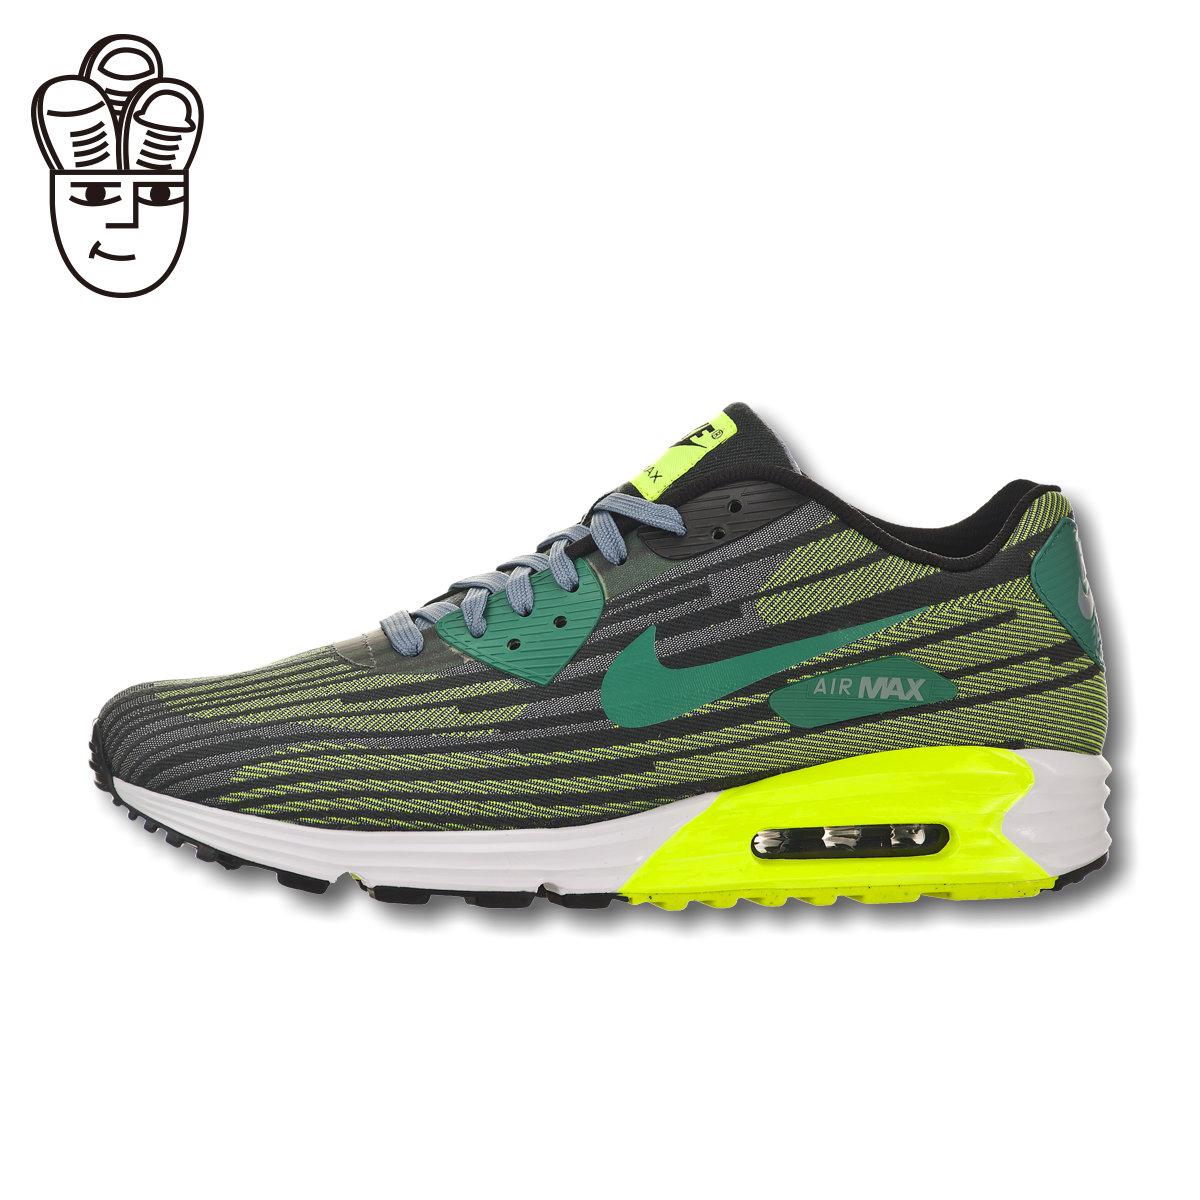 the latest b11de ccf8f Get Quotations · Nike air max lunar 90 lunar running shoes nike men jacquard  jacquard suit 654468